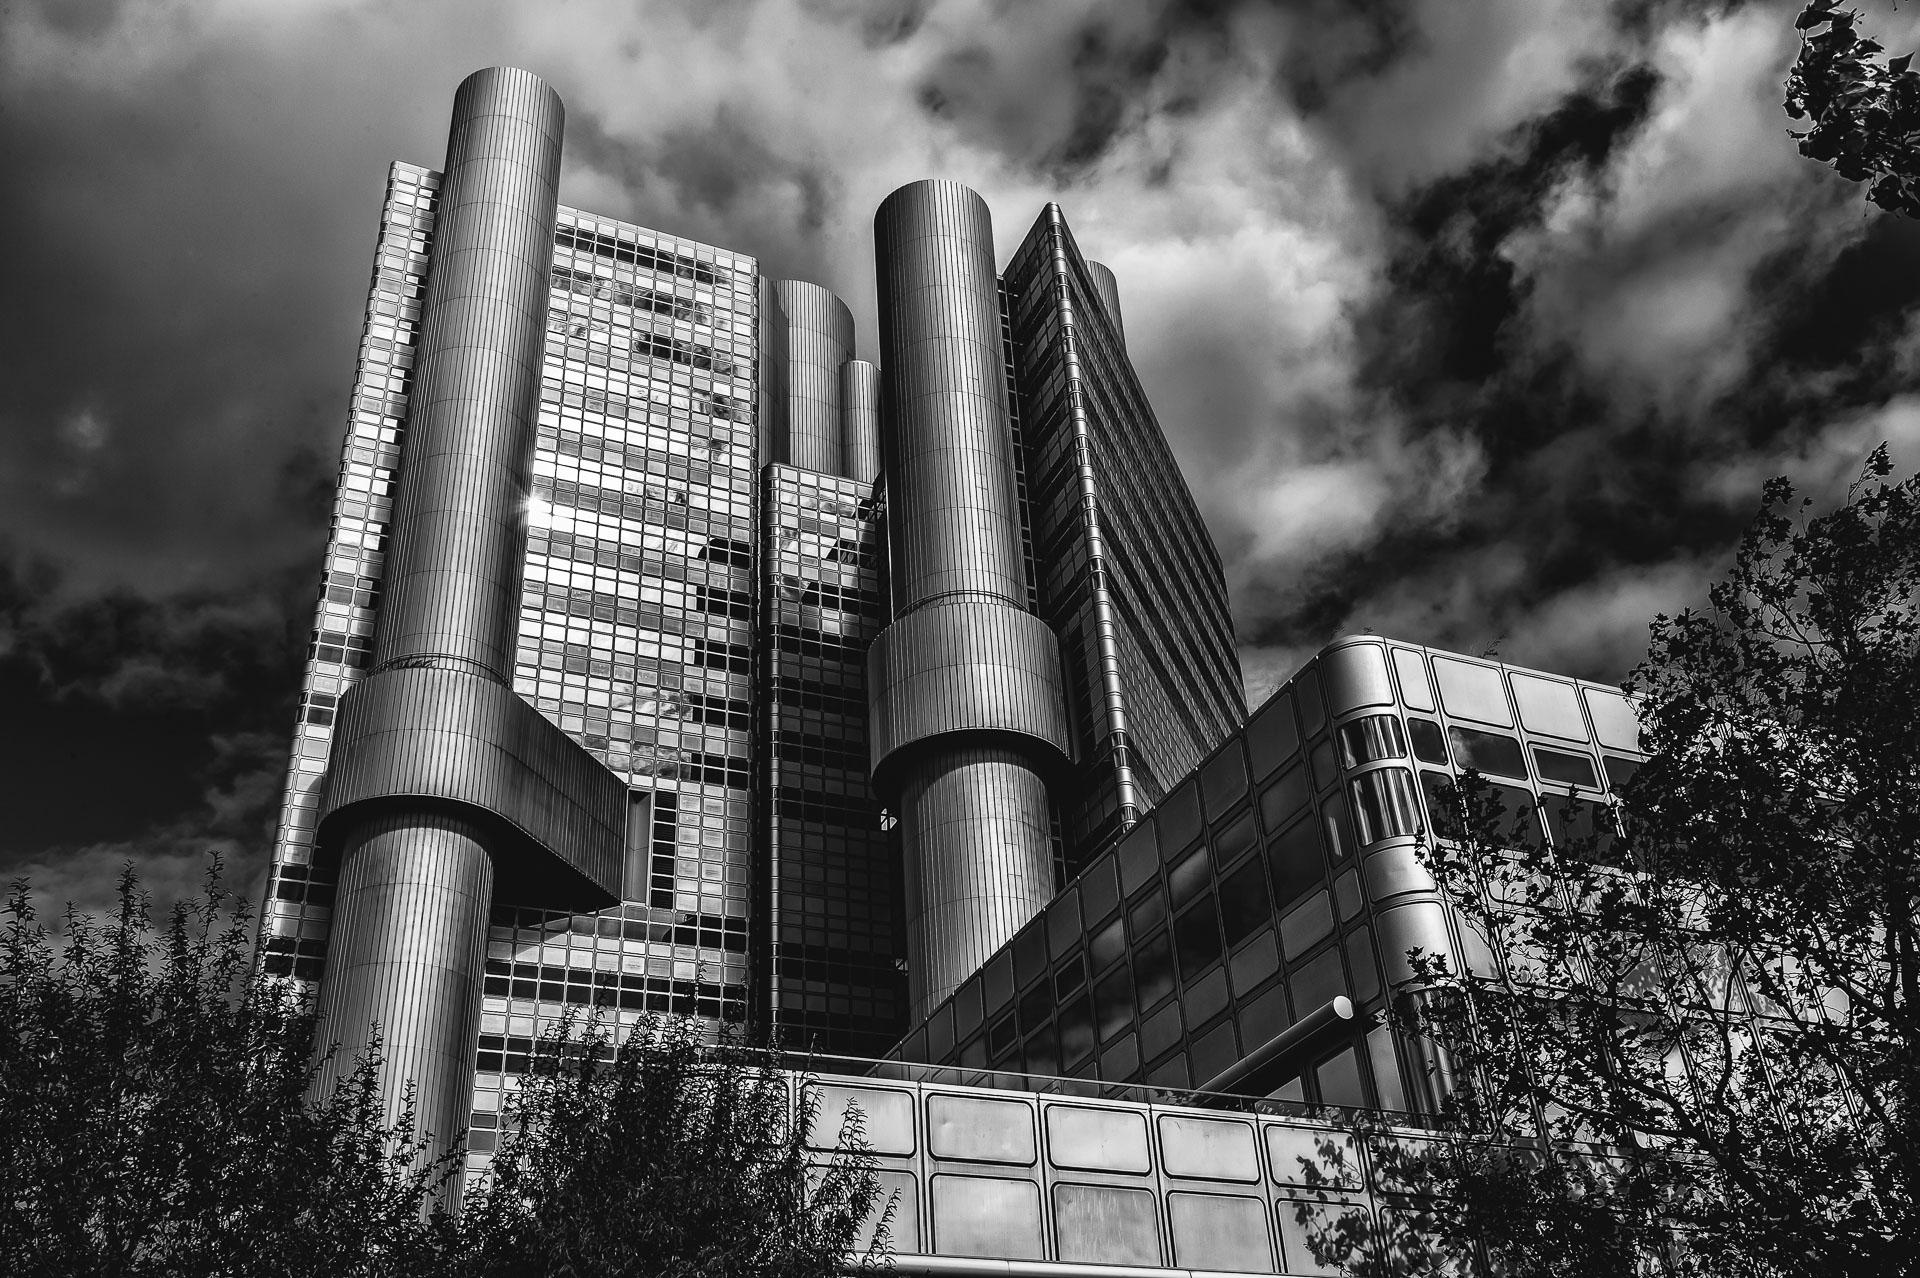 HVB-Tower / Hypo-Haus, Germany